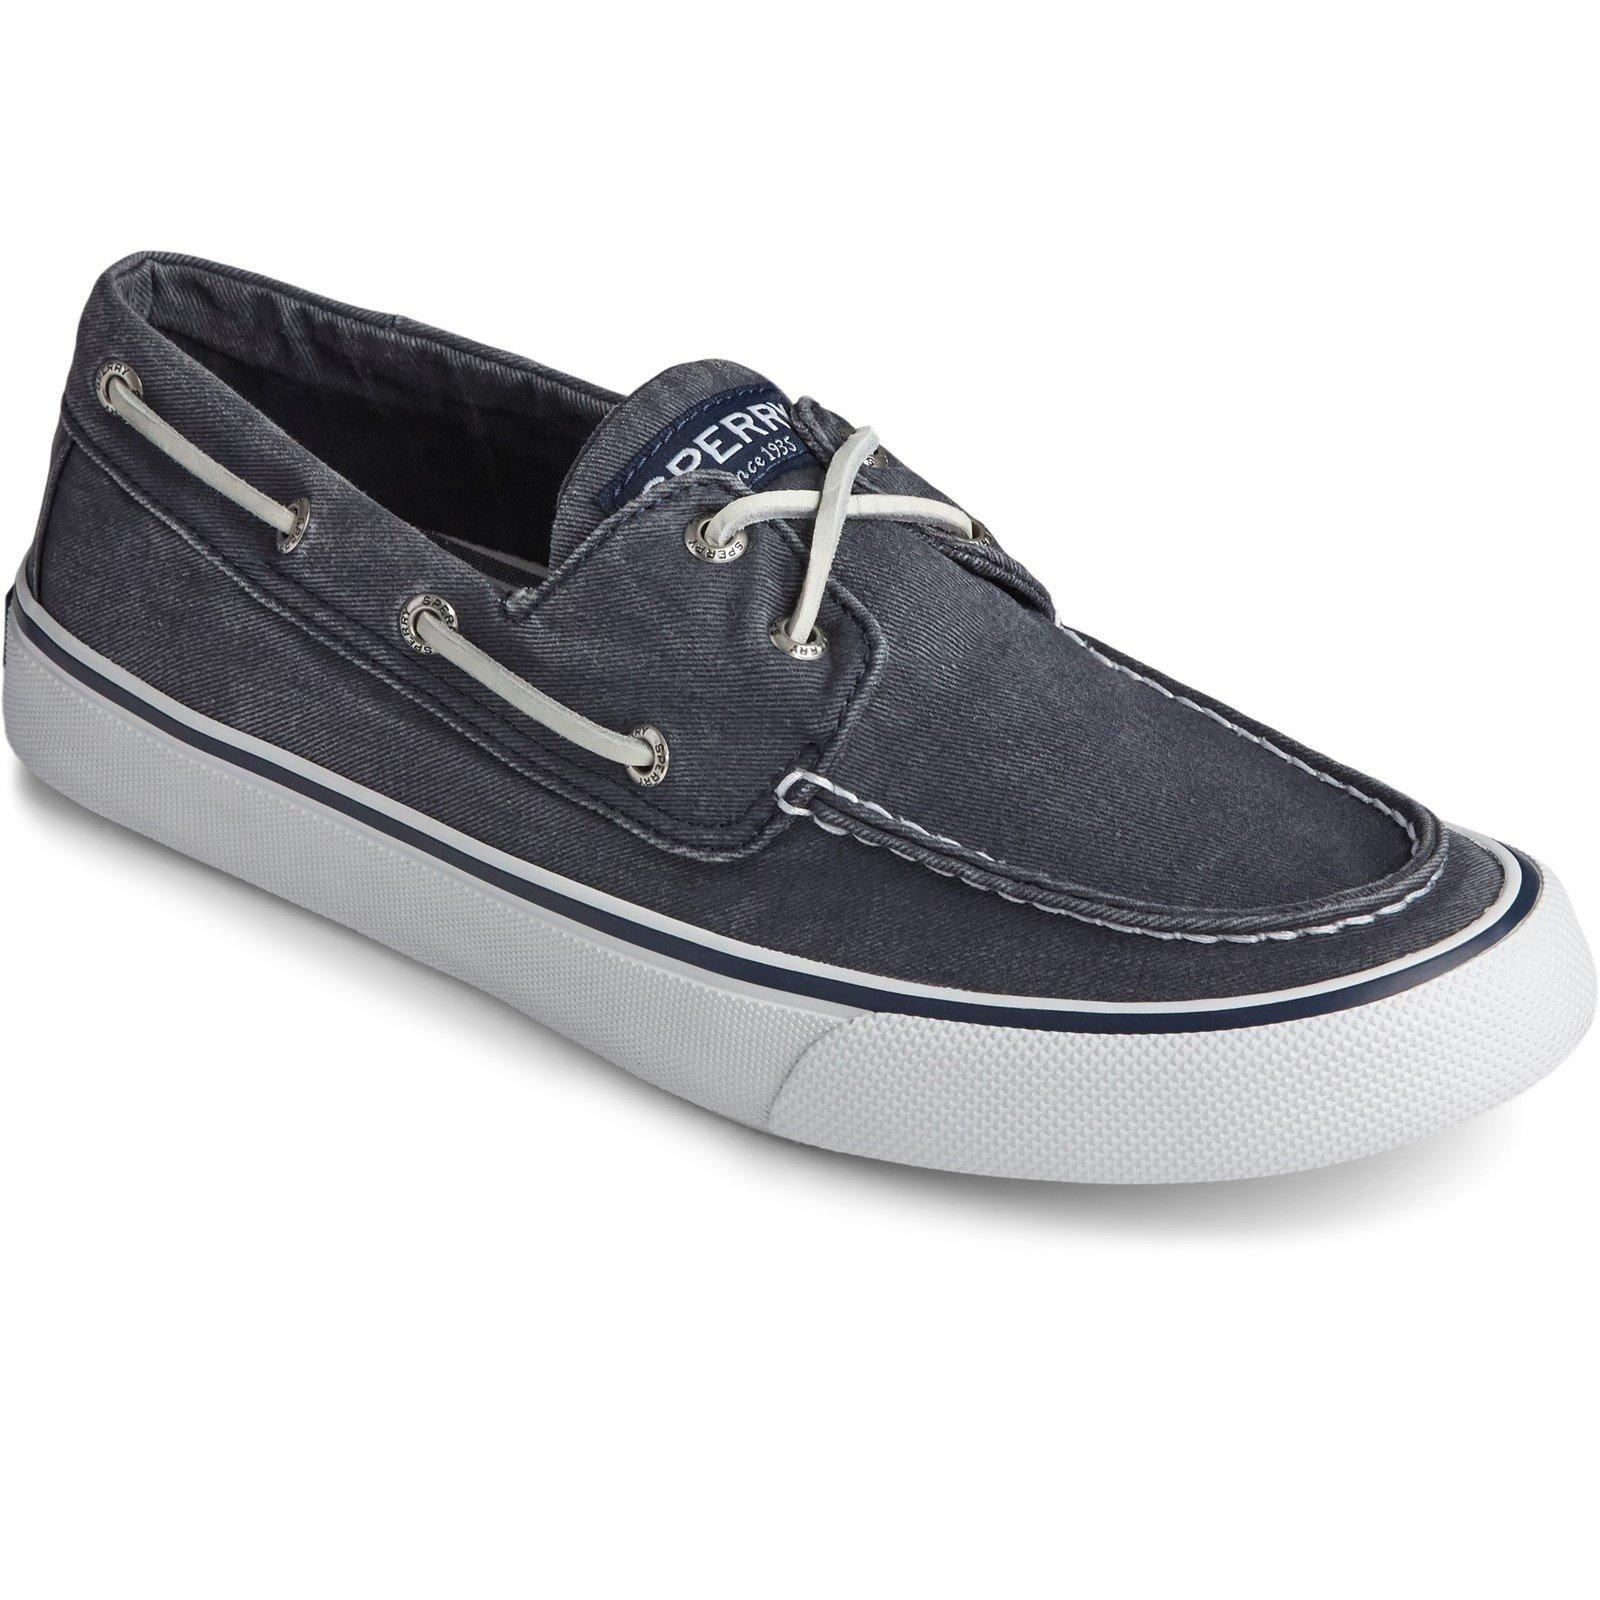 Sperry Men's Bahama II Boat Shoe Various Colours 32923 - Salt Washed Navy 13